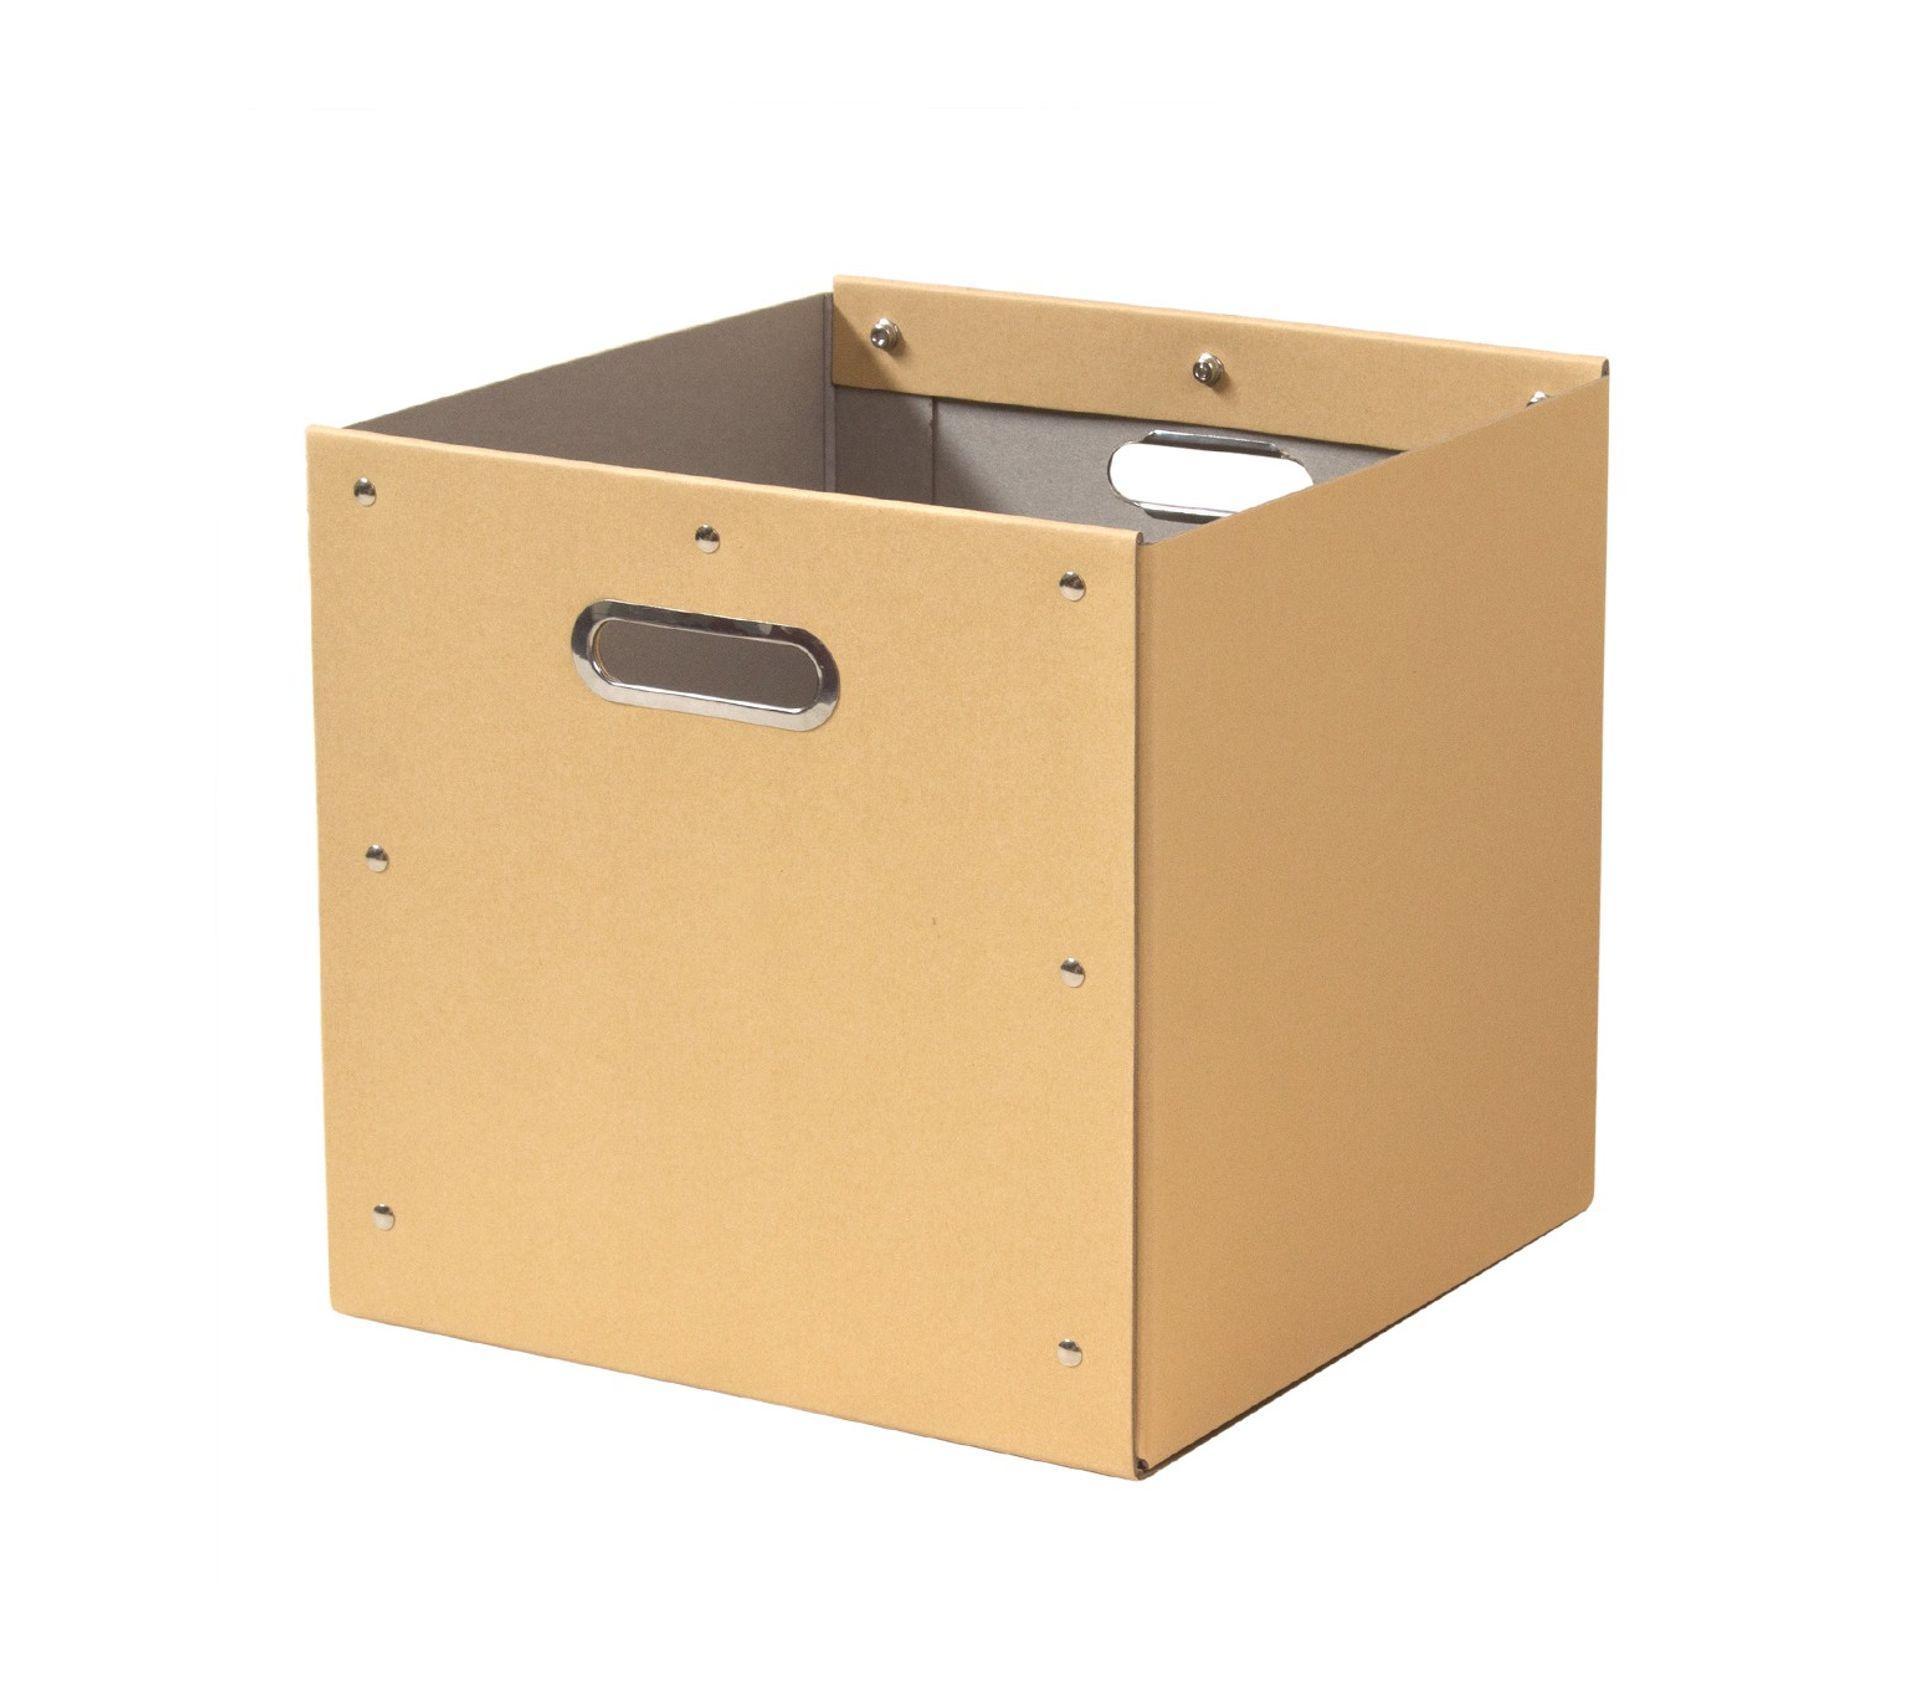 Cube De Rangement En Kraft Finition Metal Panier But